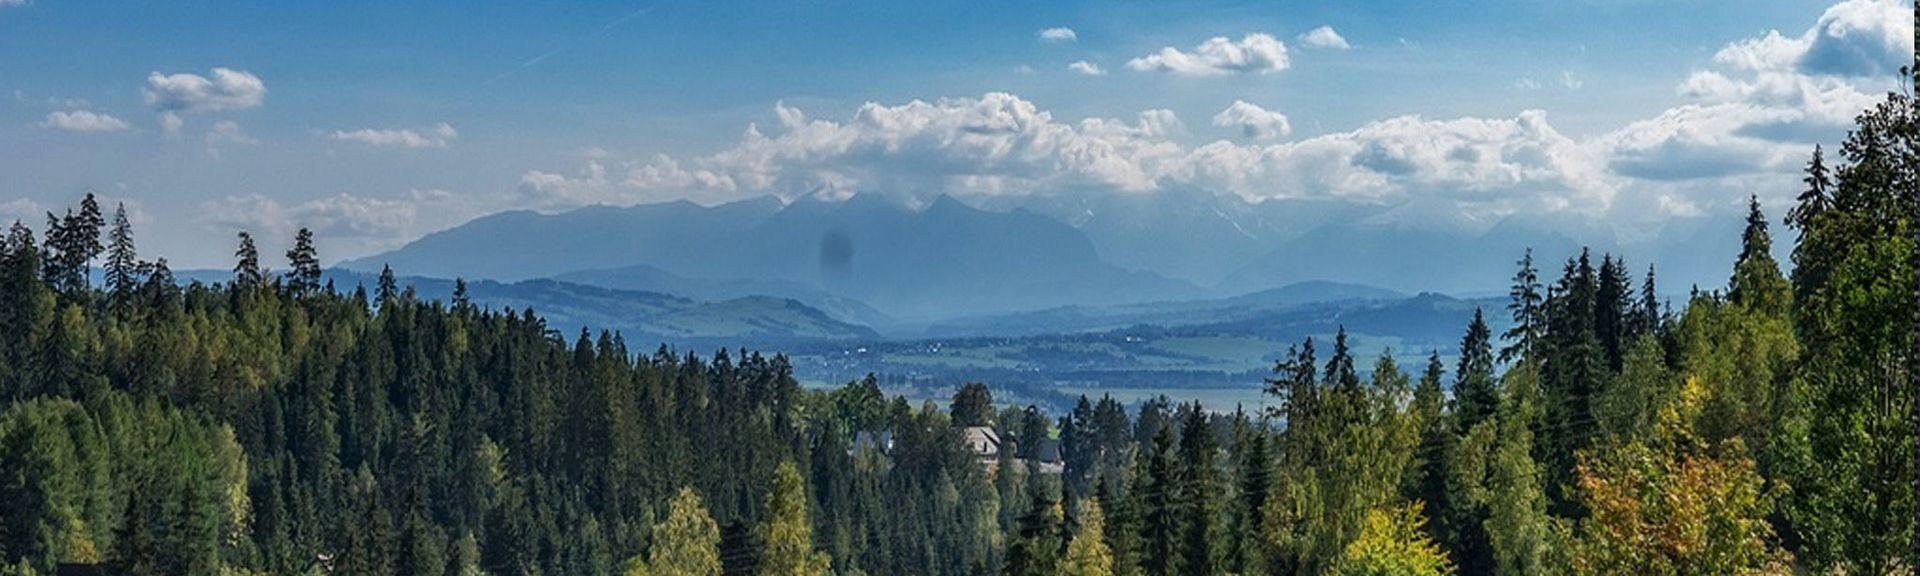 Nowy Targ County, Lesser Poland Voivodeship, Poland